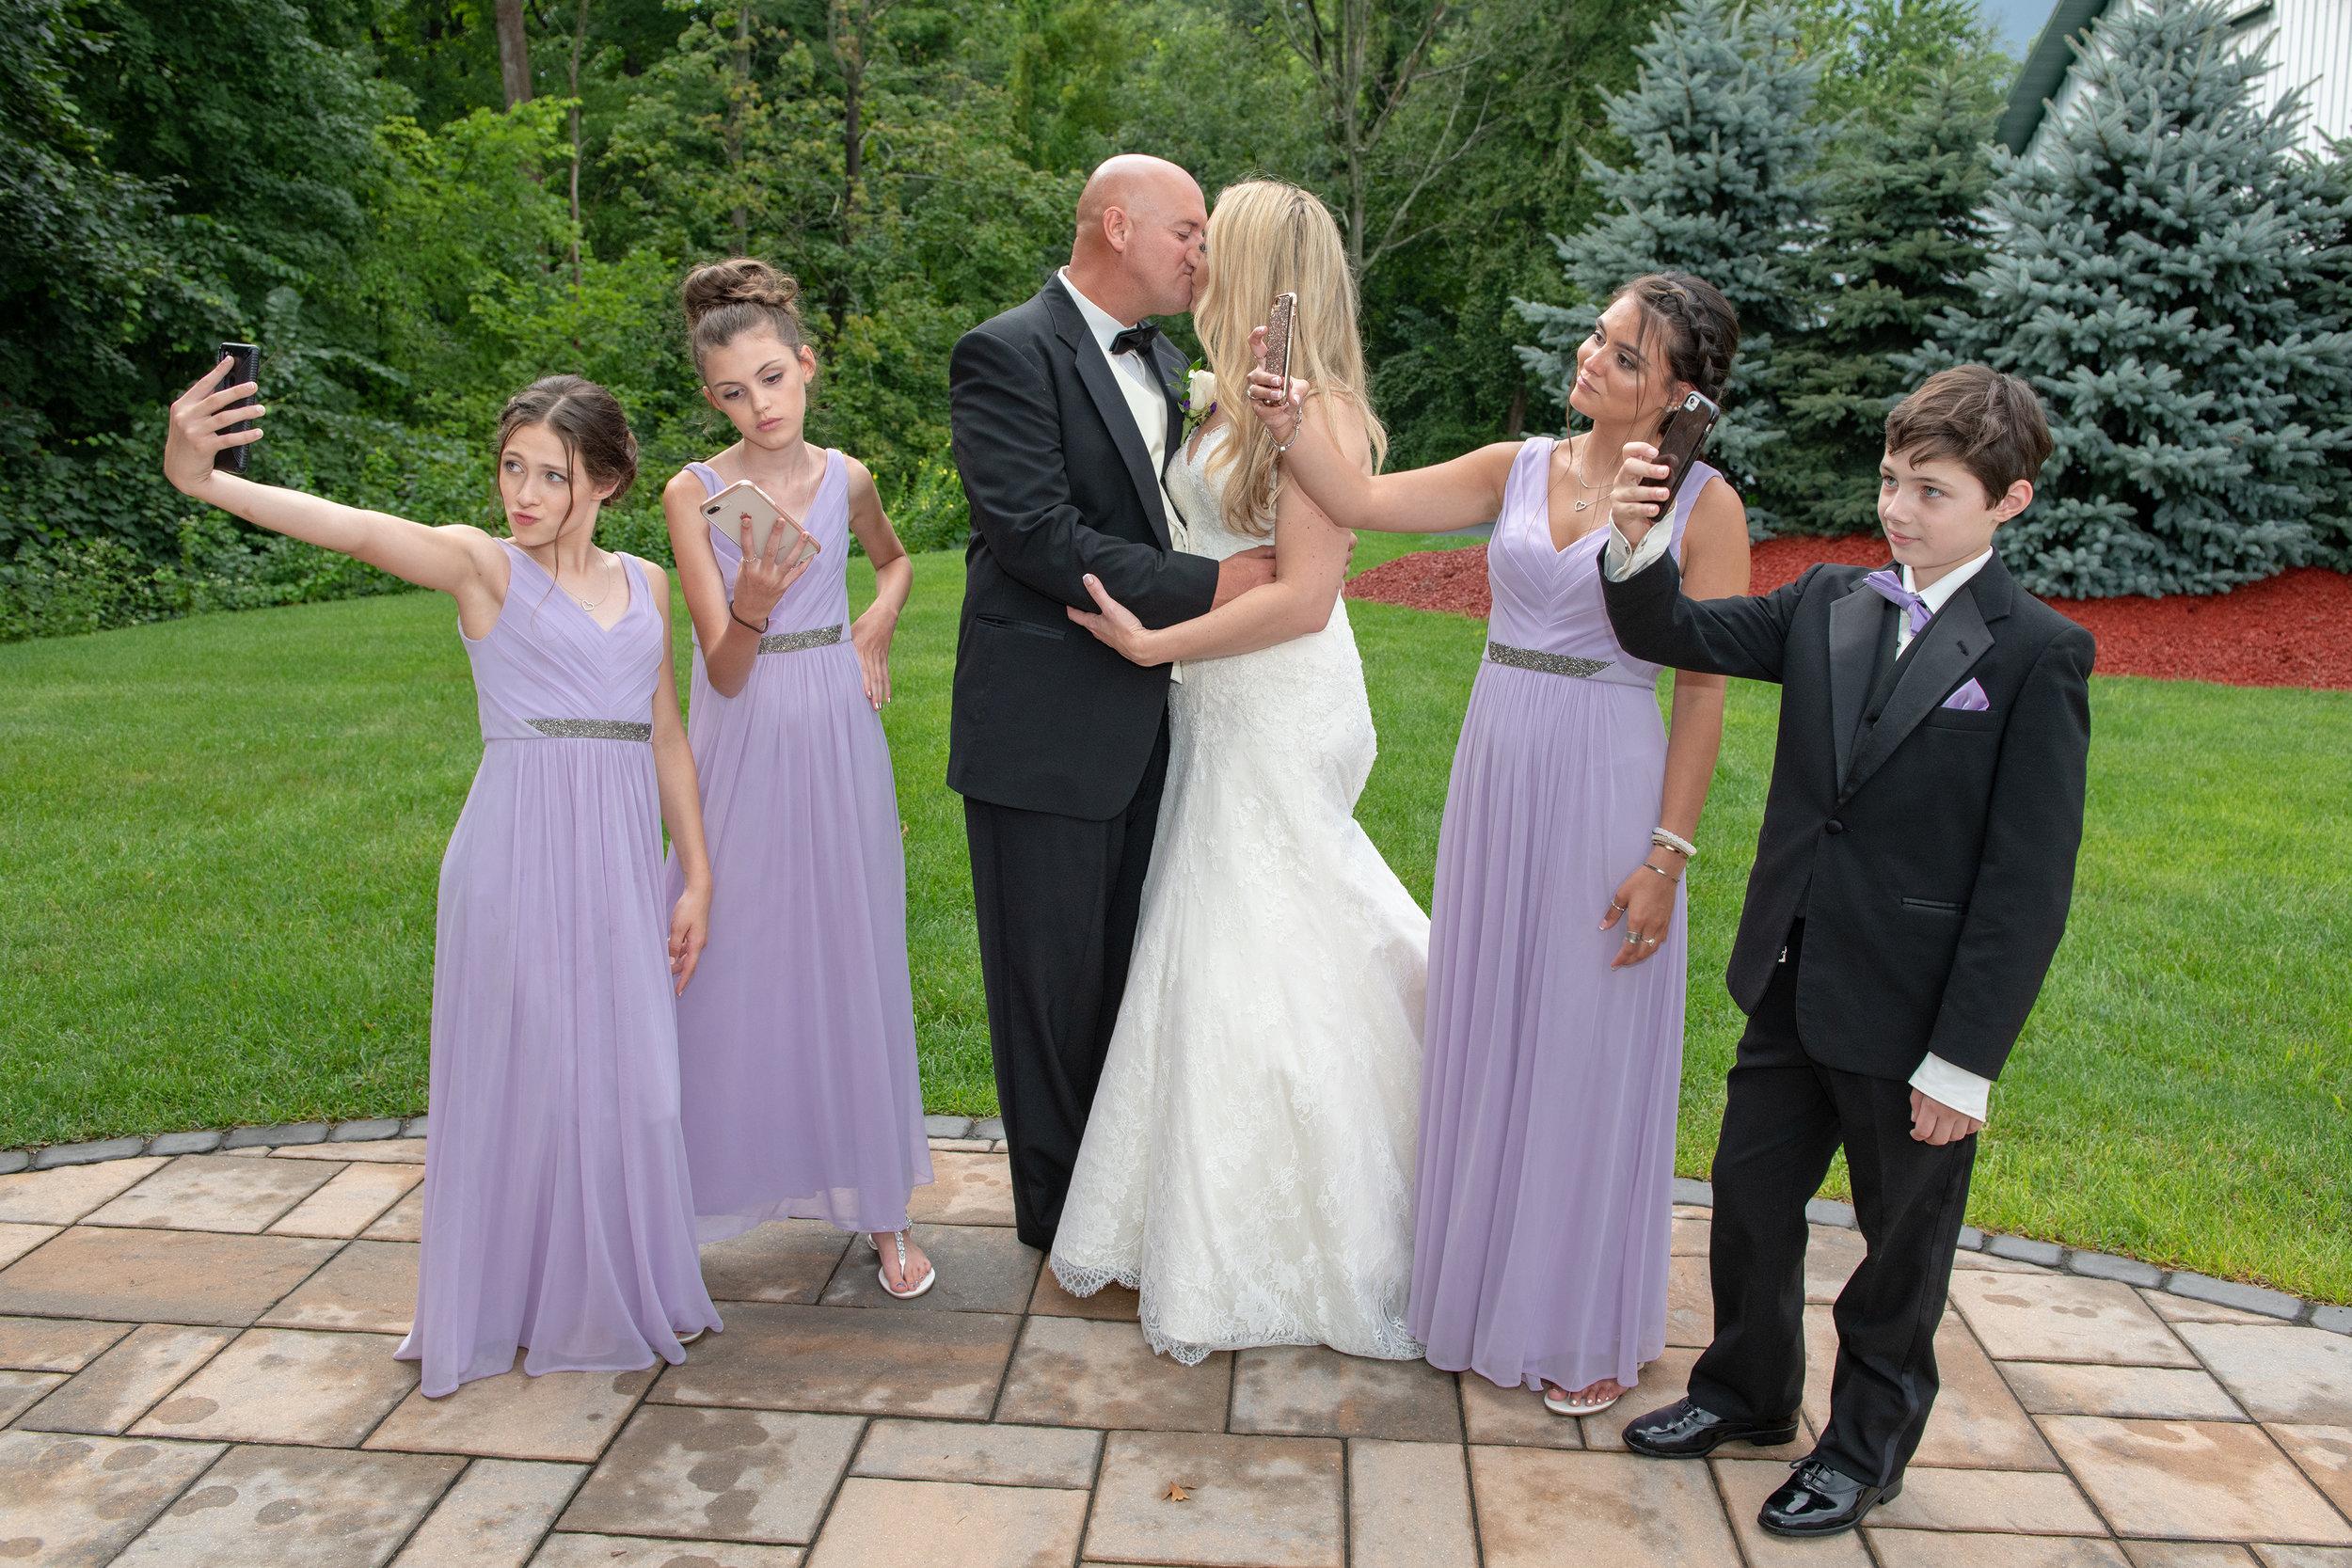 The Selfie Wedding Photo